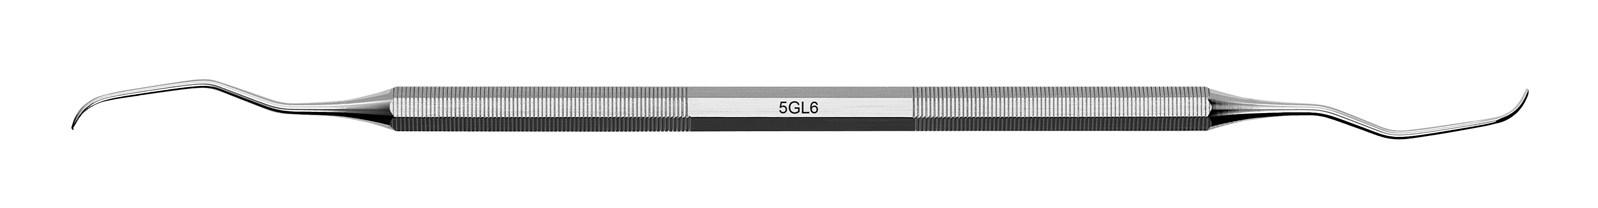 Kyreta Gracey Deep - 5GL6, ADEP žlutý